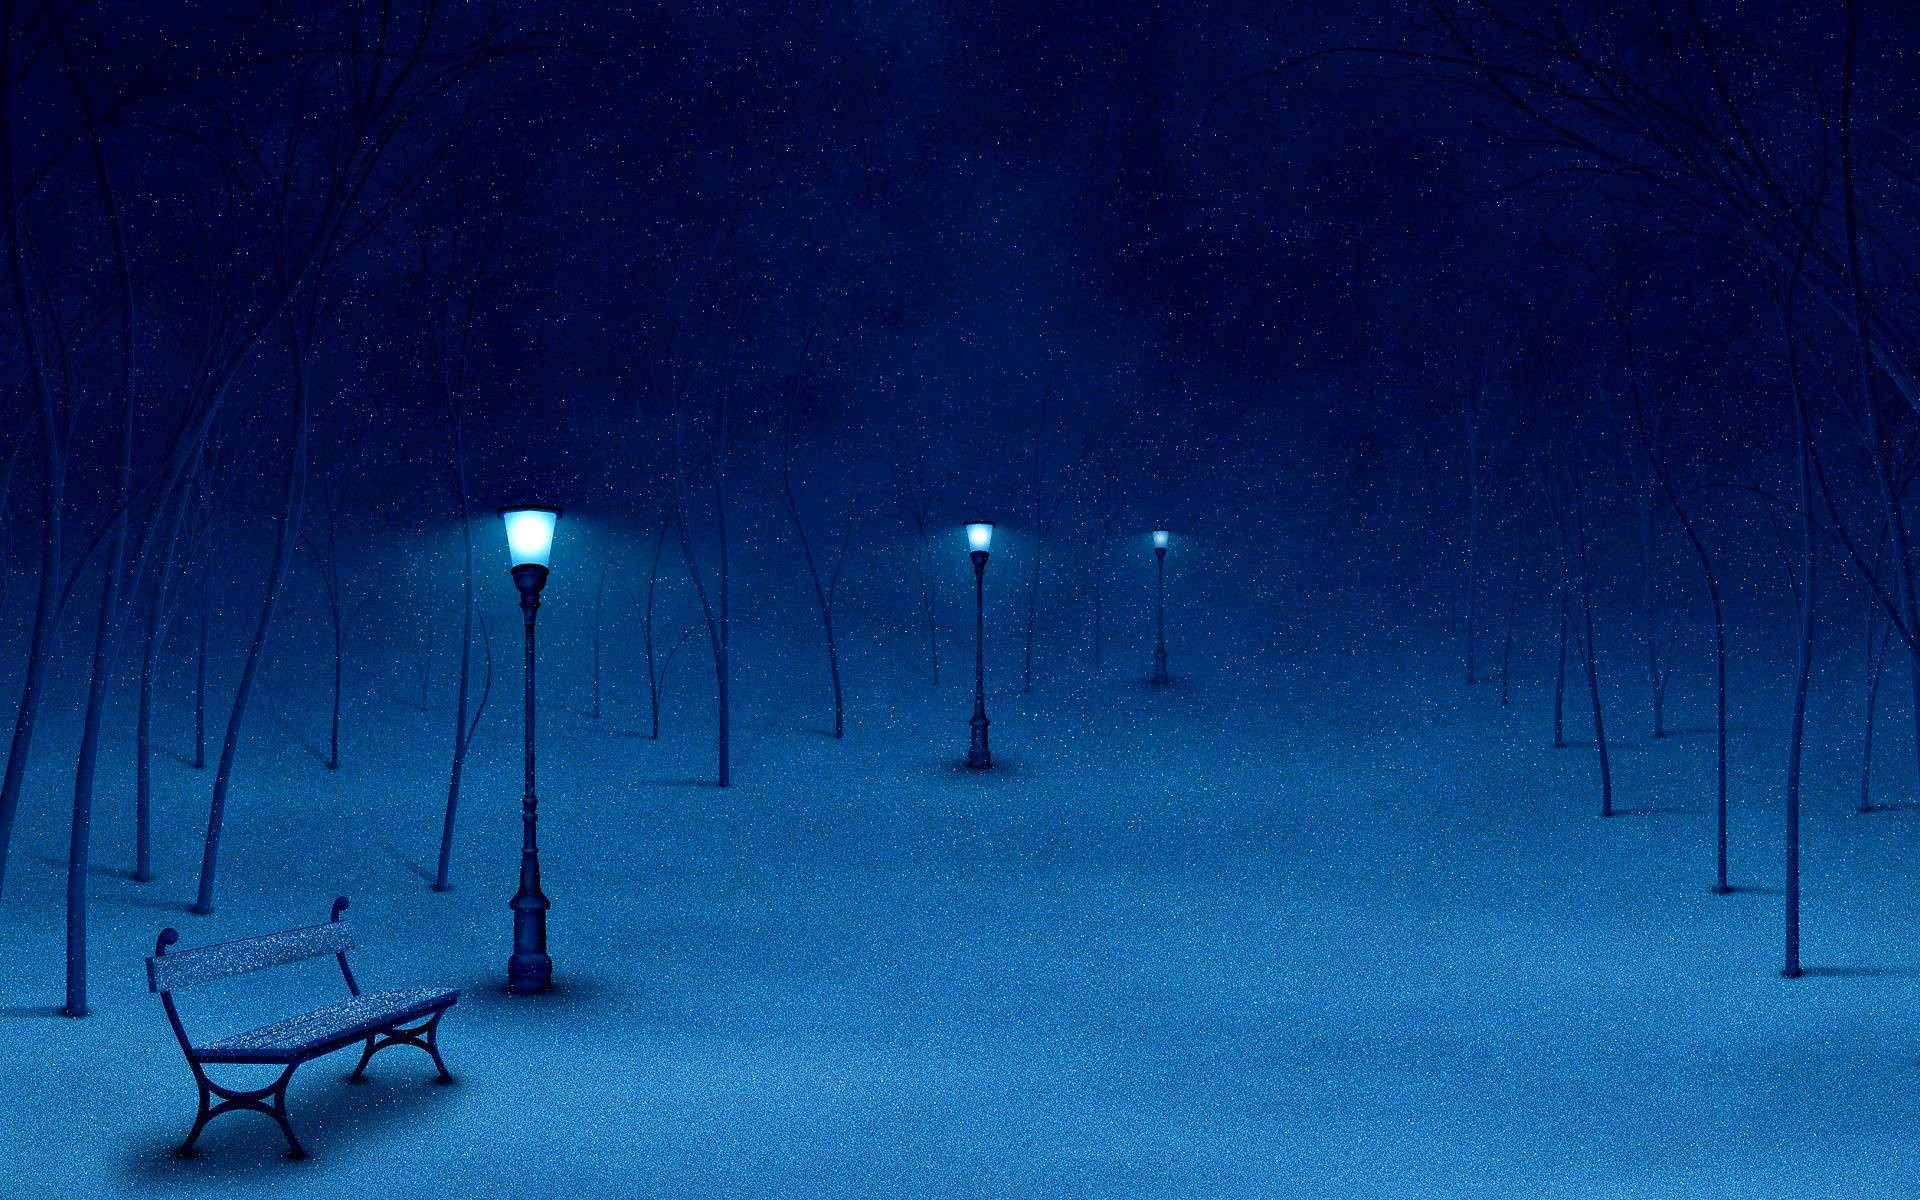 Winter Night HD Wallpaper | Wallpapers | Pinterest | Winter night and Hd  wallpaper